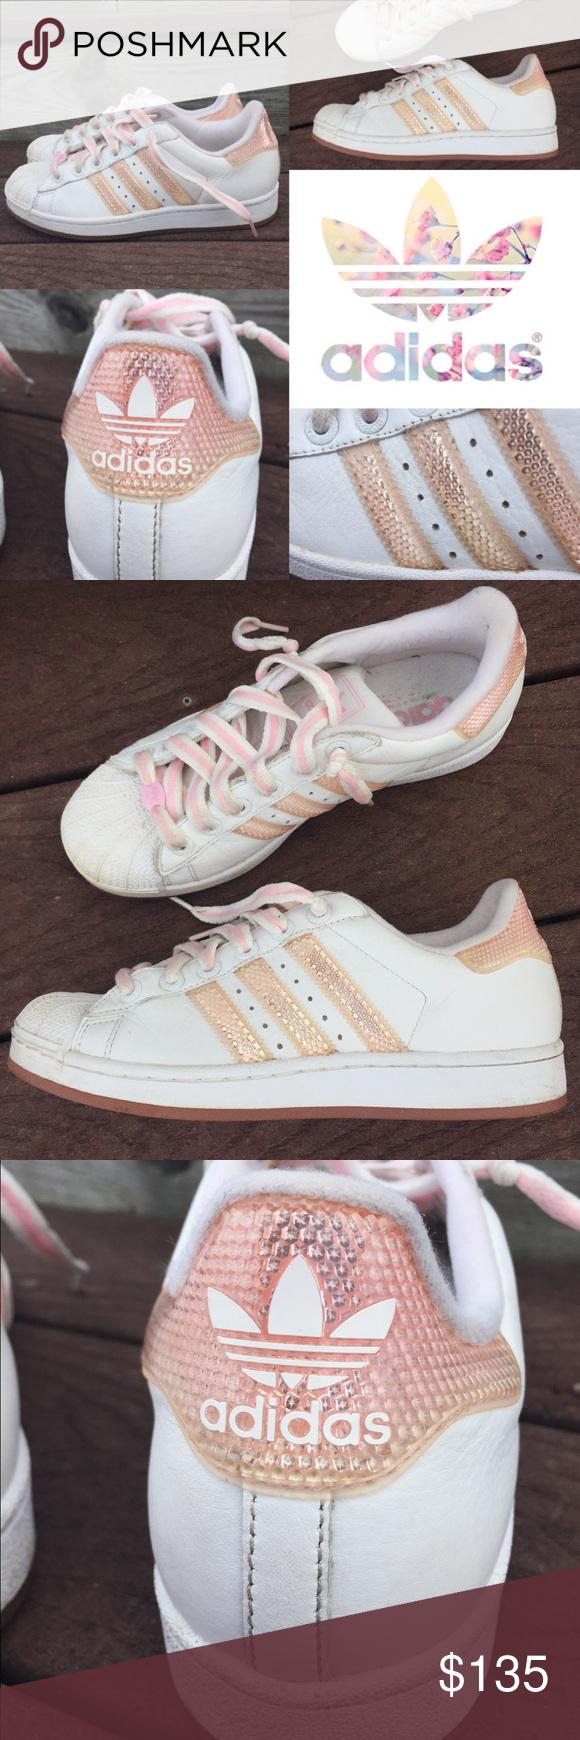 Rare Adidas superstar pink reflective